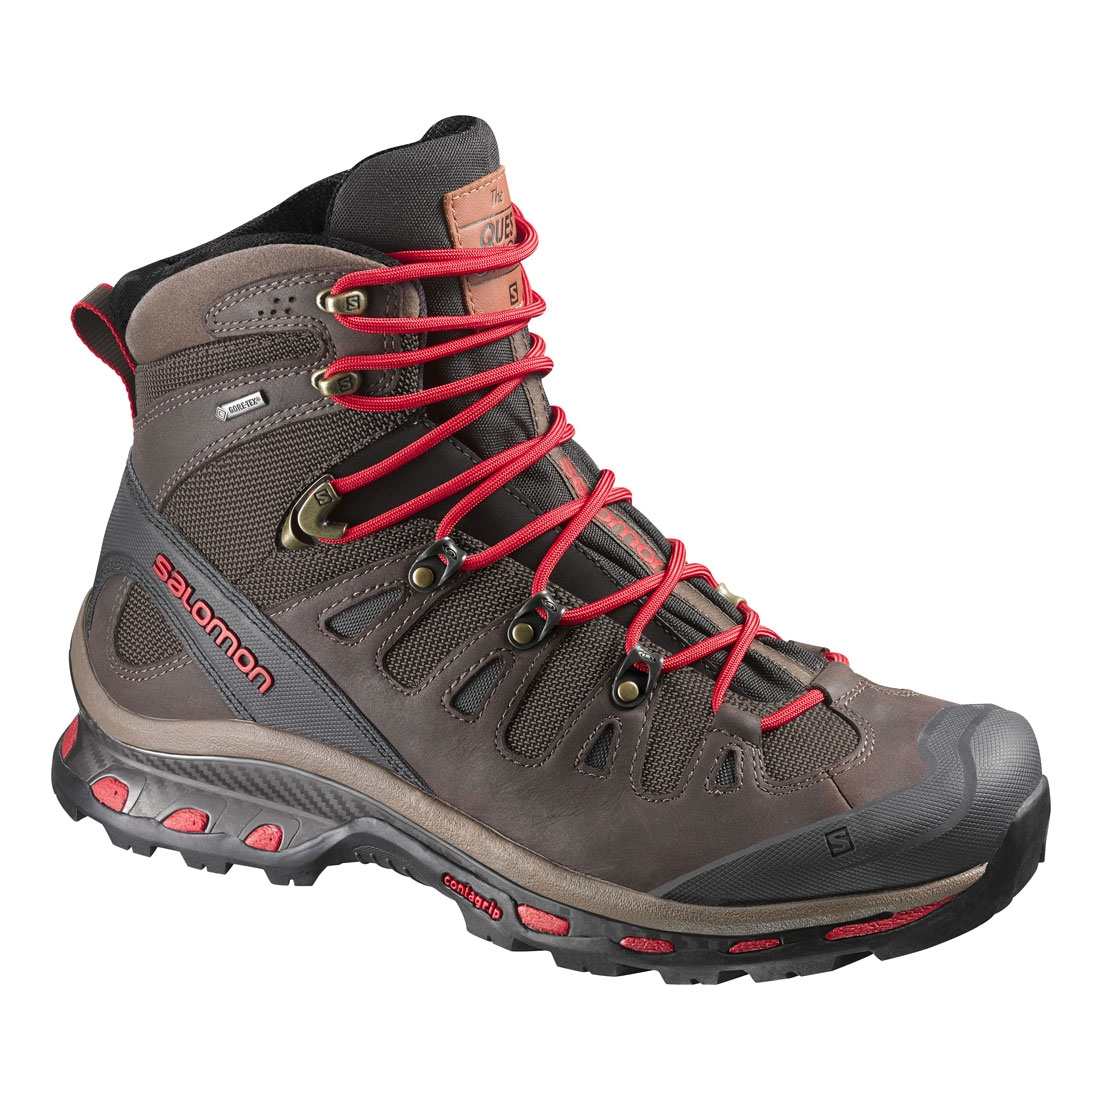 6a095c531be8 Image of Salomon Quest Origins GTX Walking Boots (Men s) - Absolute Brown-X